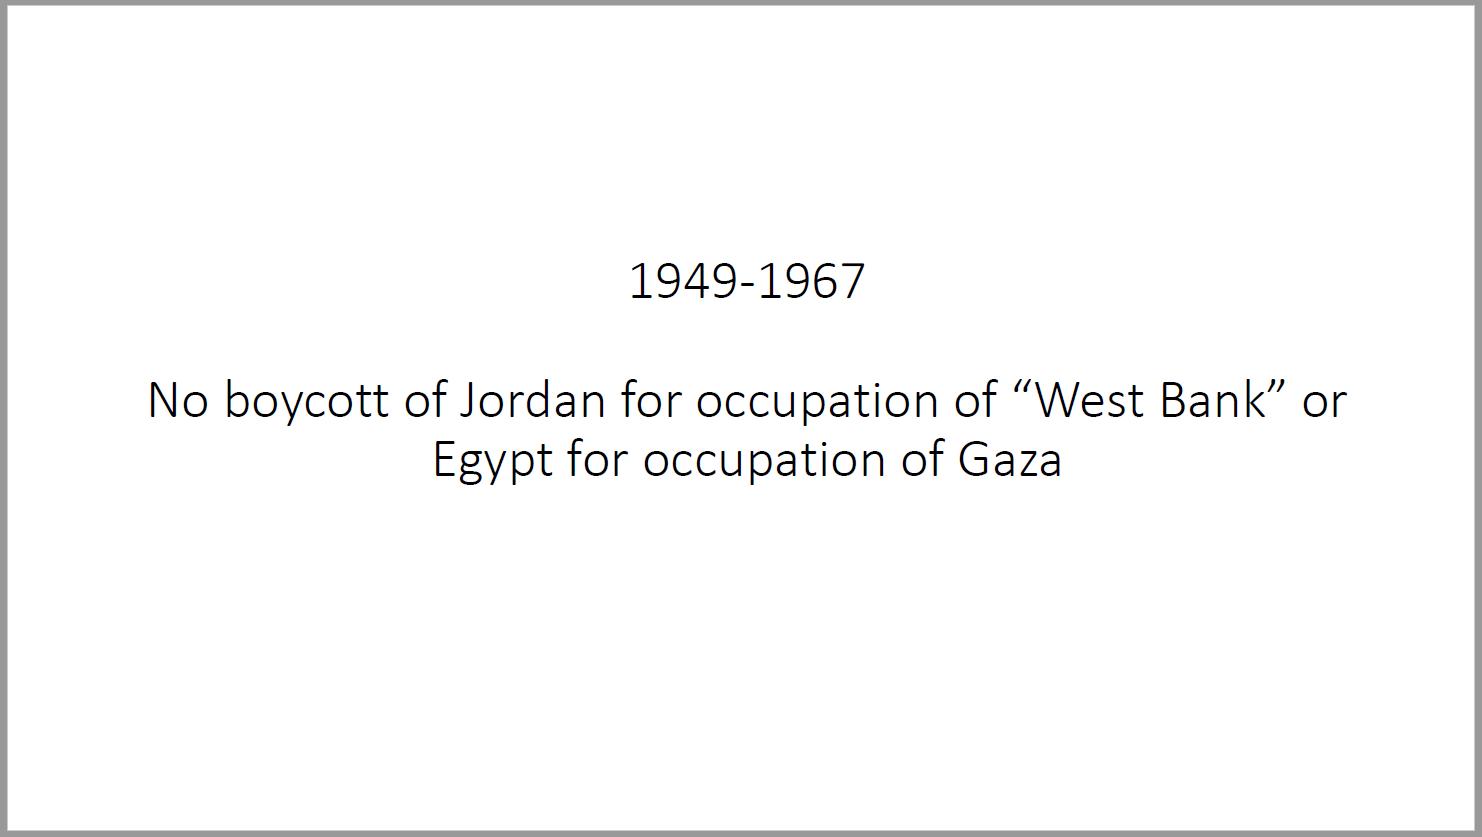 bds-history-slide-arab-league-no-boycott-jordan-egypt